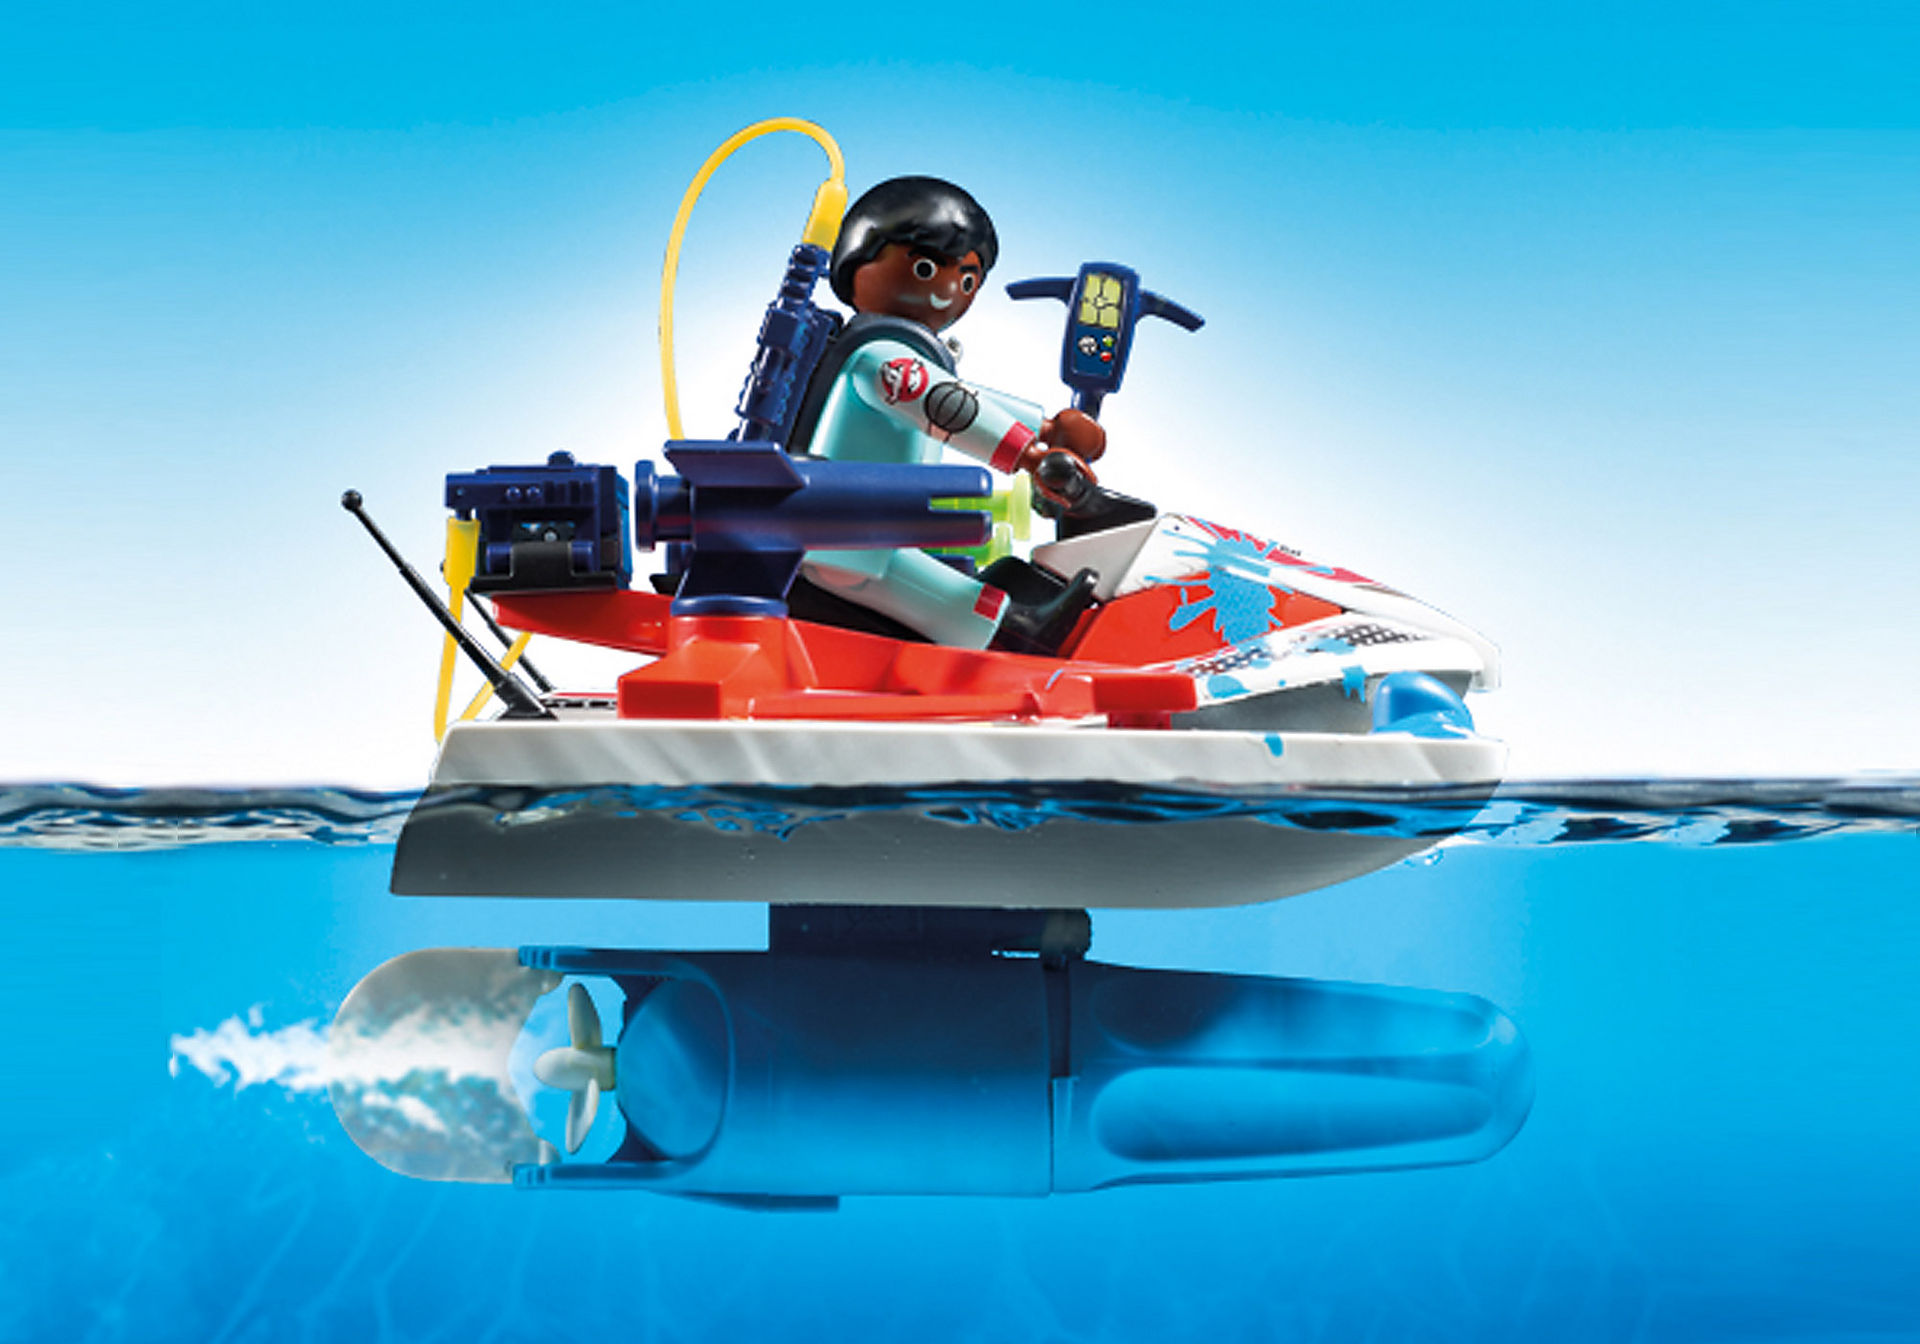 http://media.playmobil.com/i/playmobil/9387_product_extra3/Zeddemore avec scooter des mers